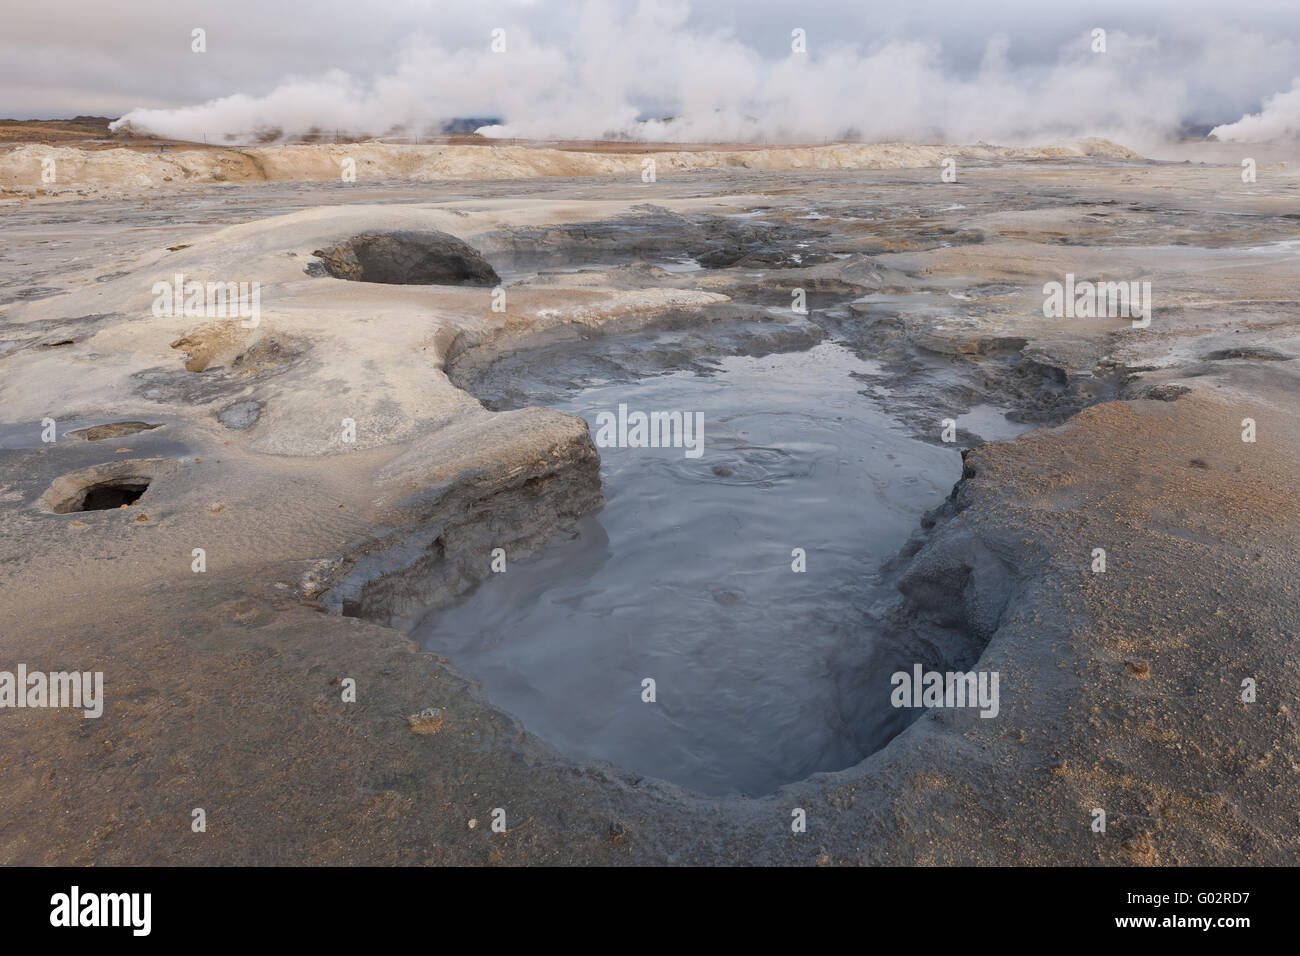 Iceland, mudpot at Hverarönd - Stock Image